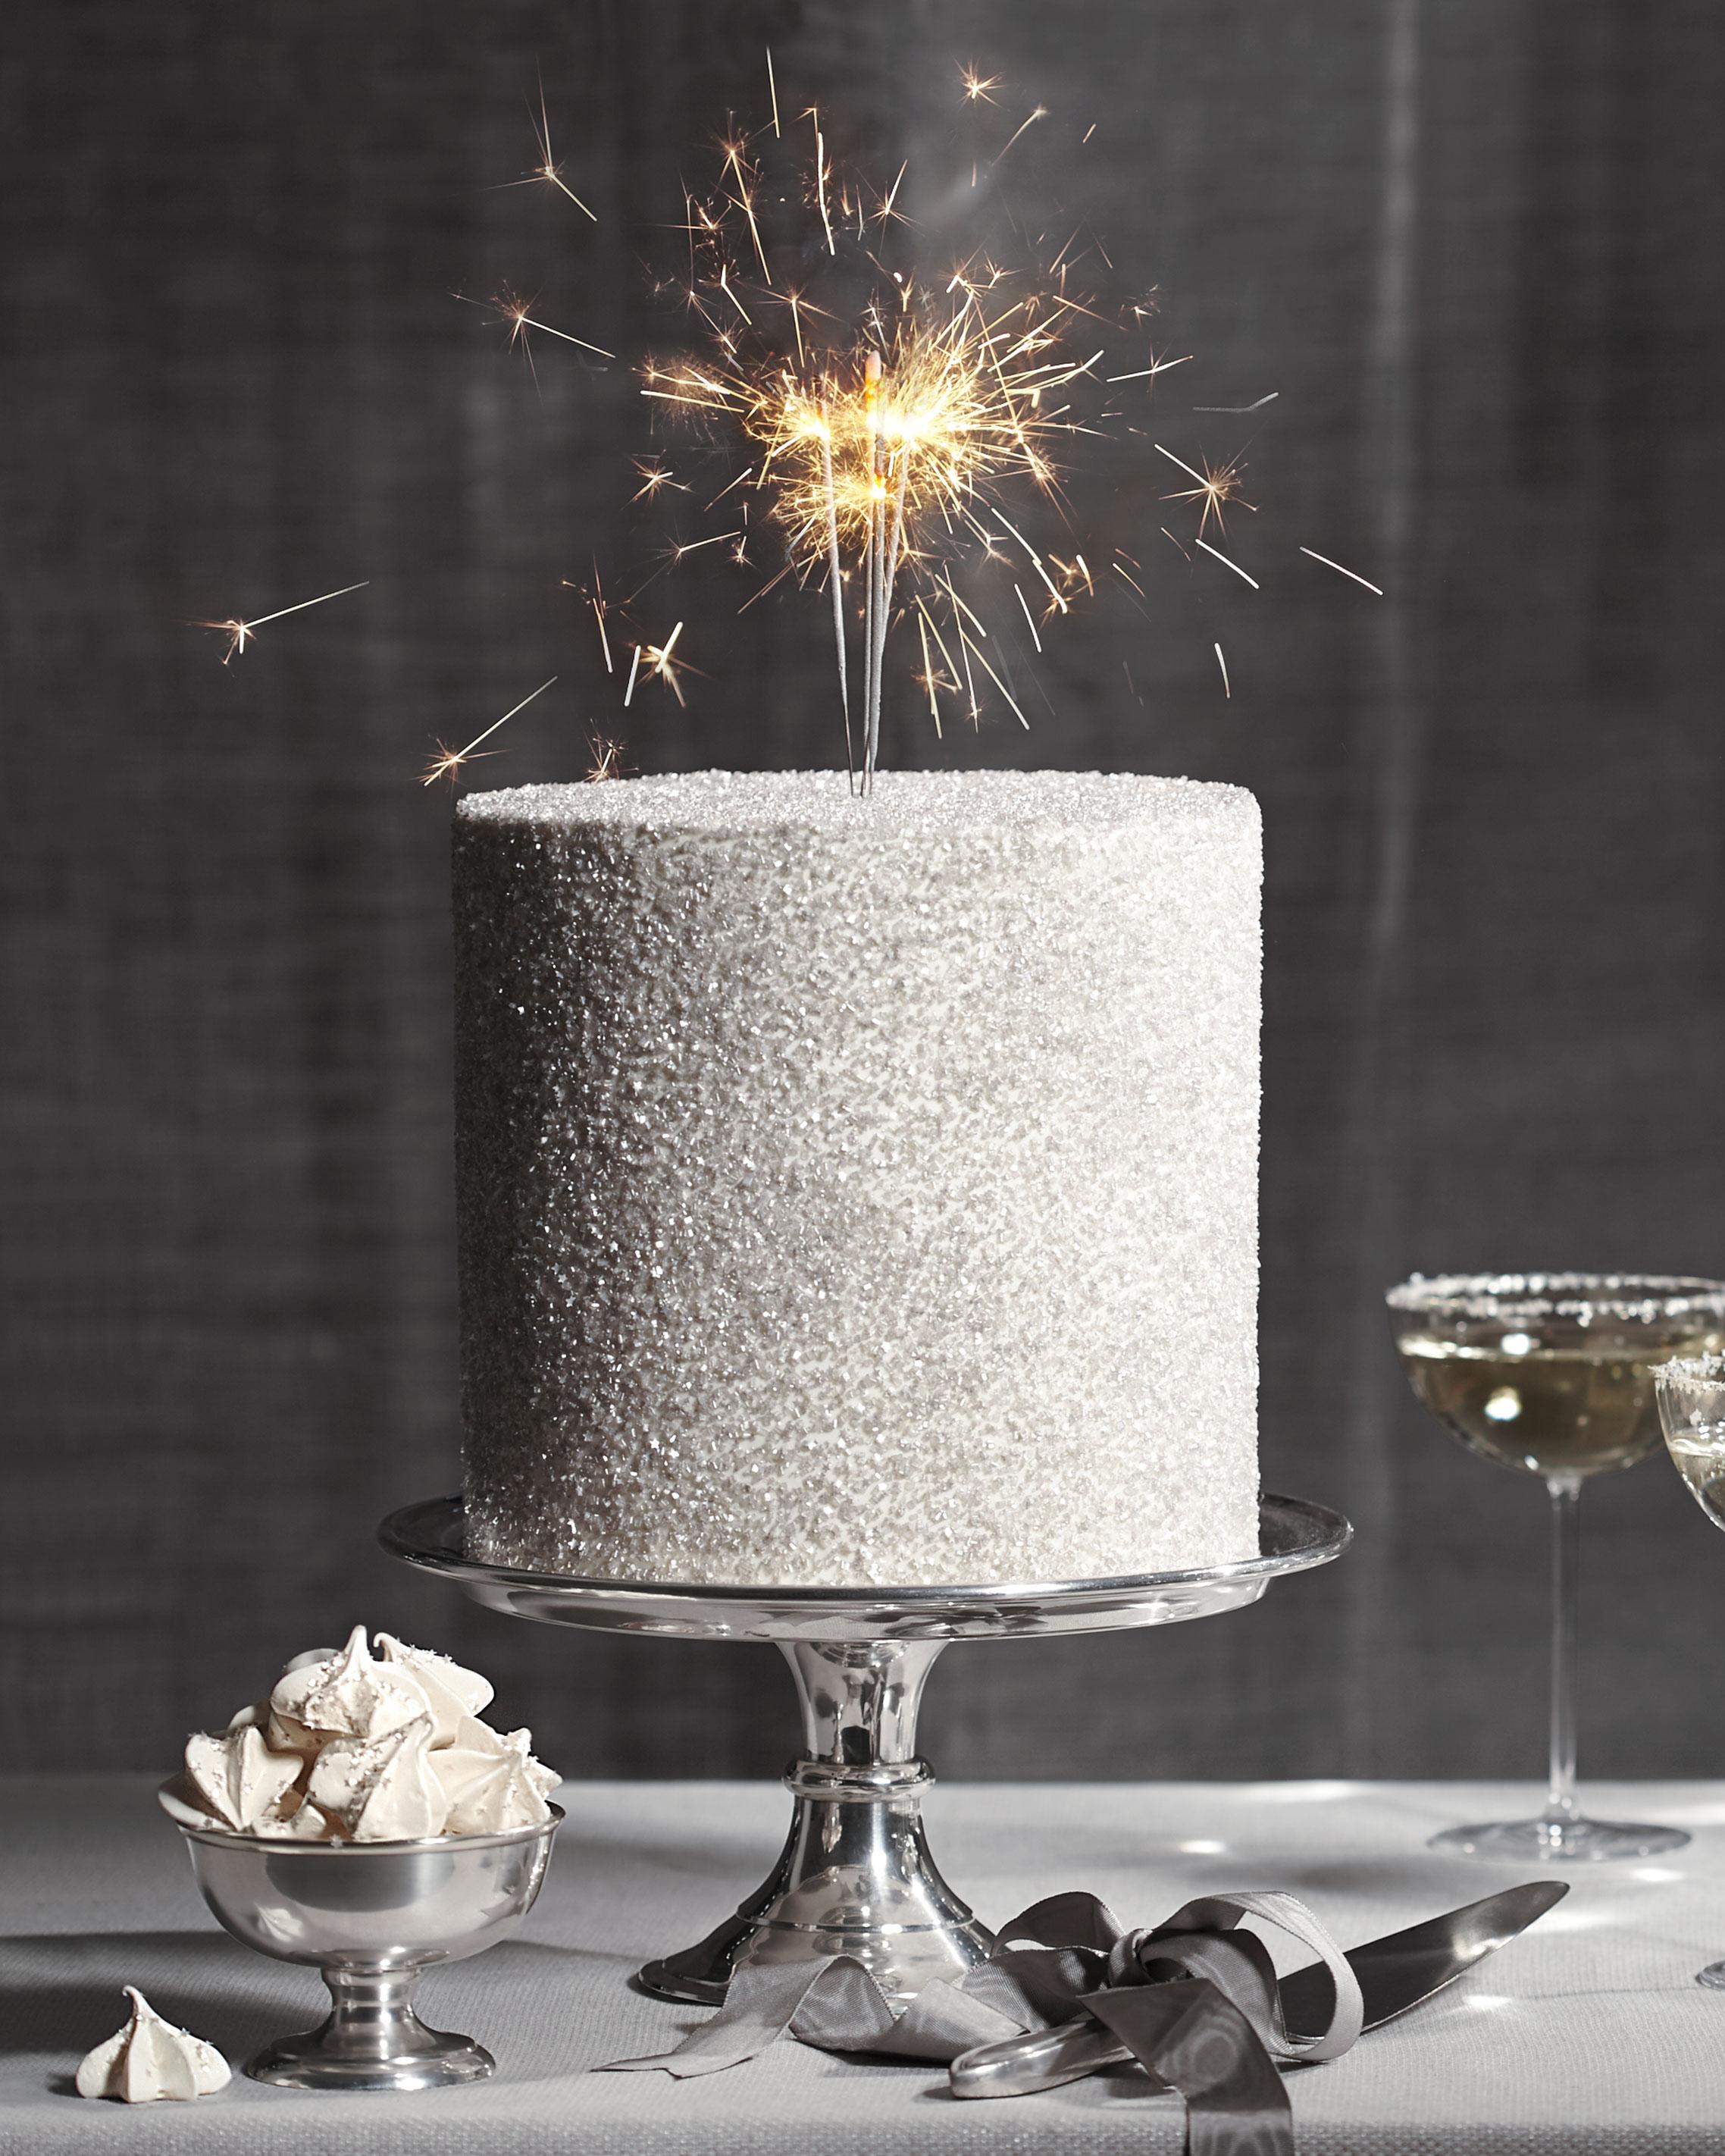 glittercake-289-sparklers-290-comp-mwd110528.jpg